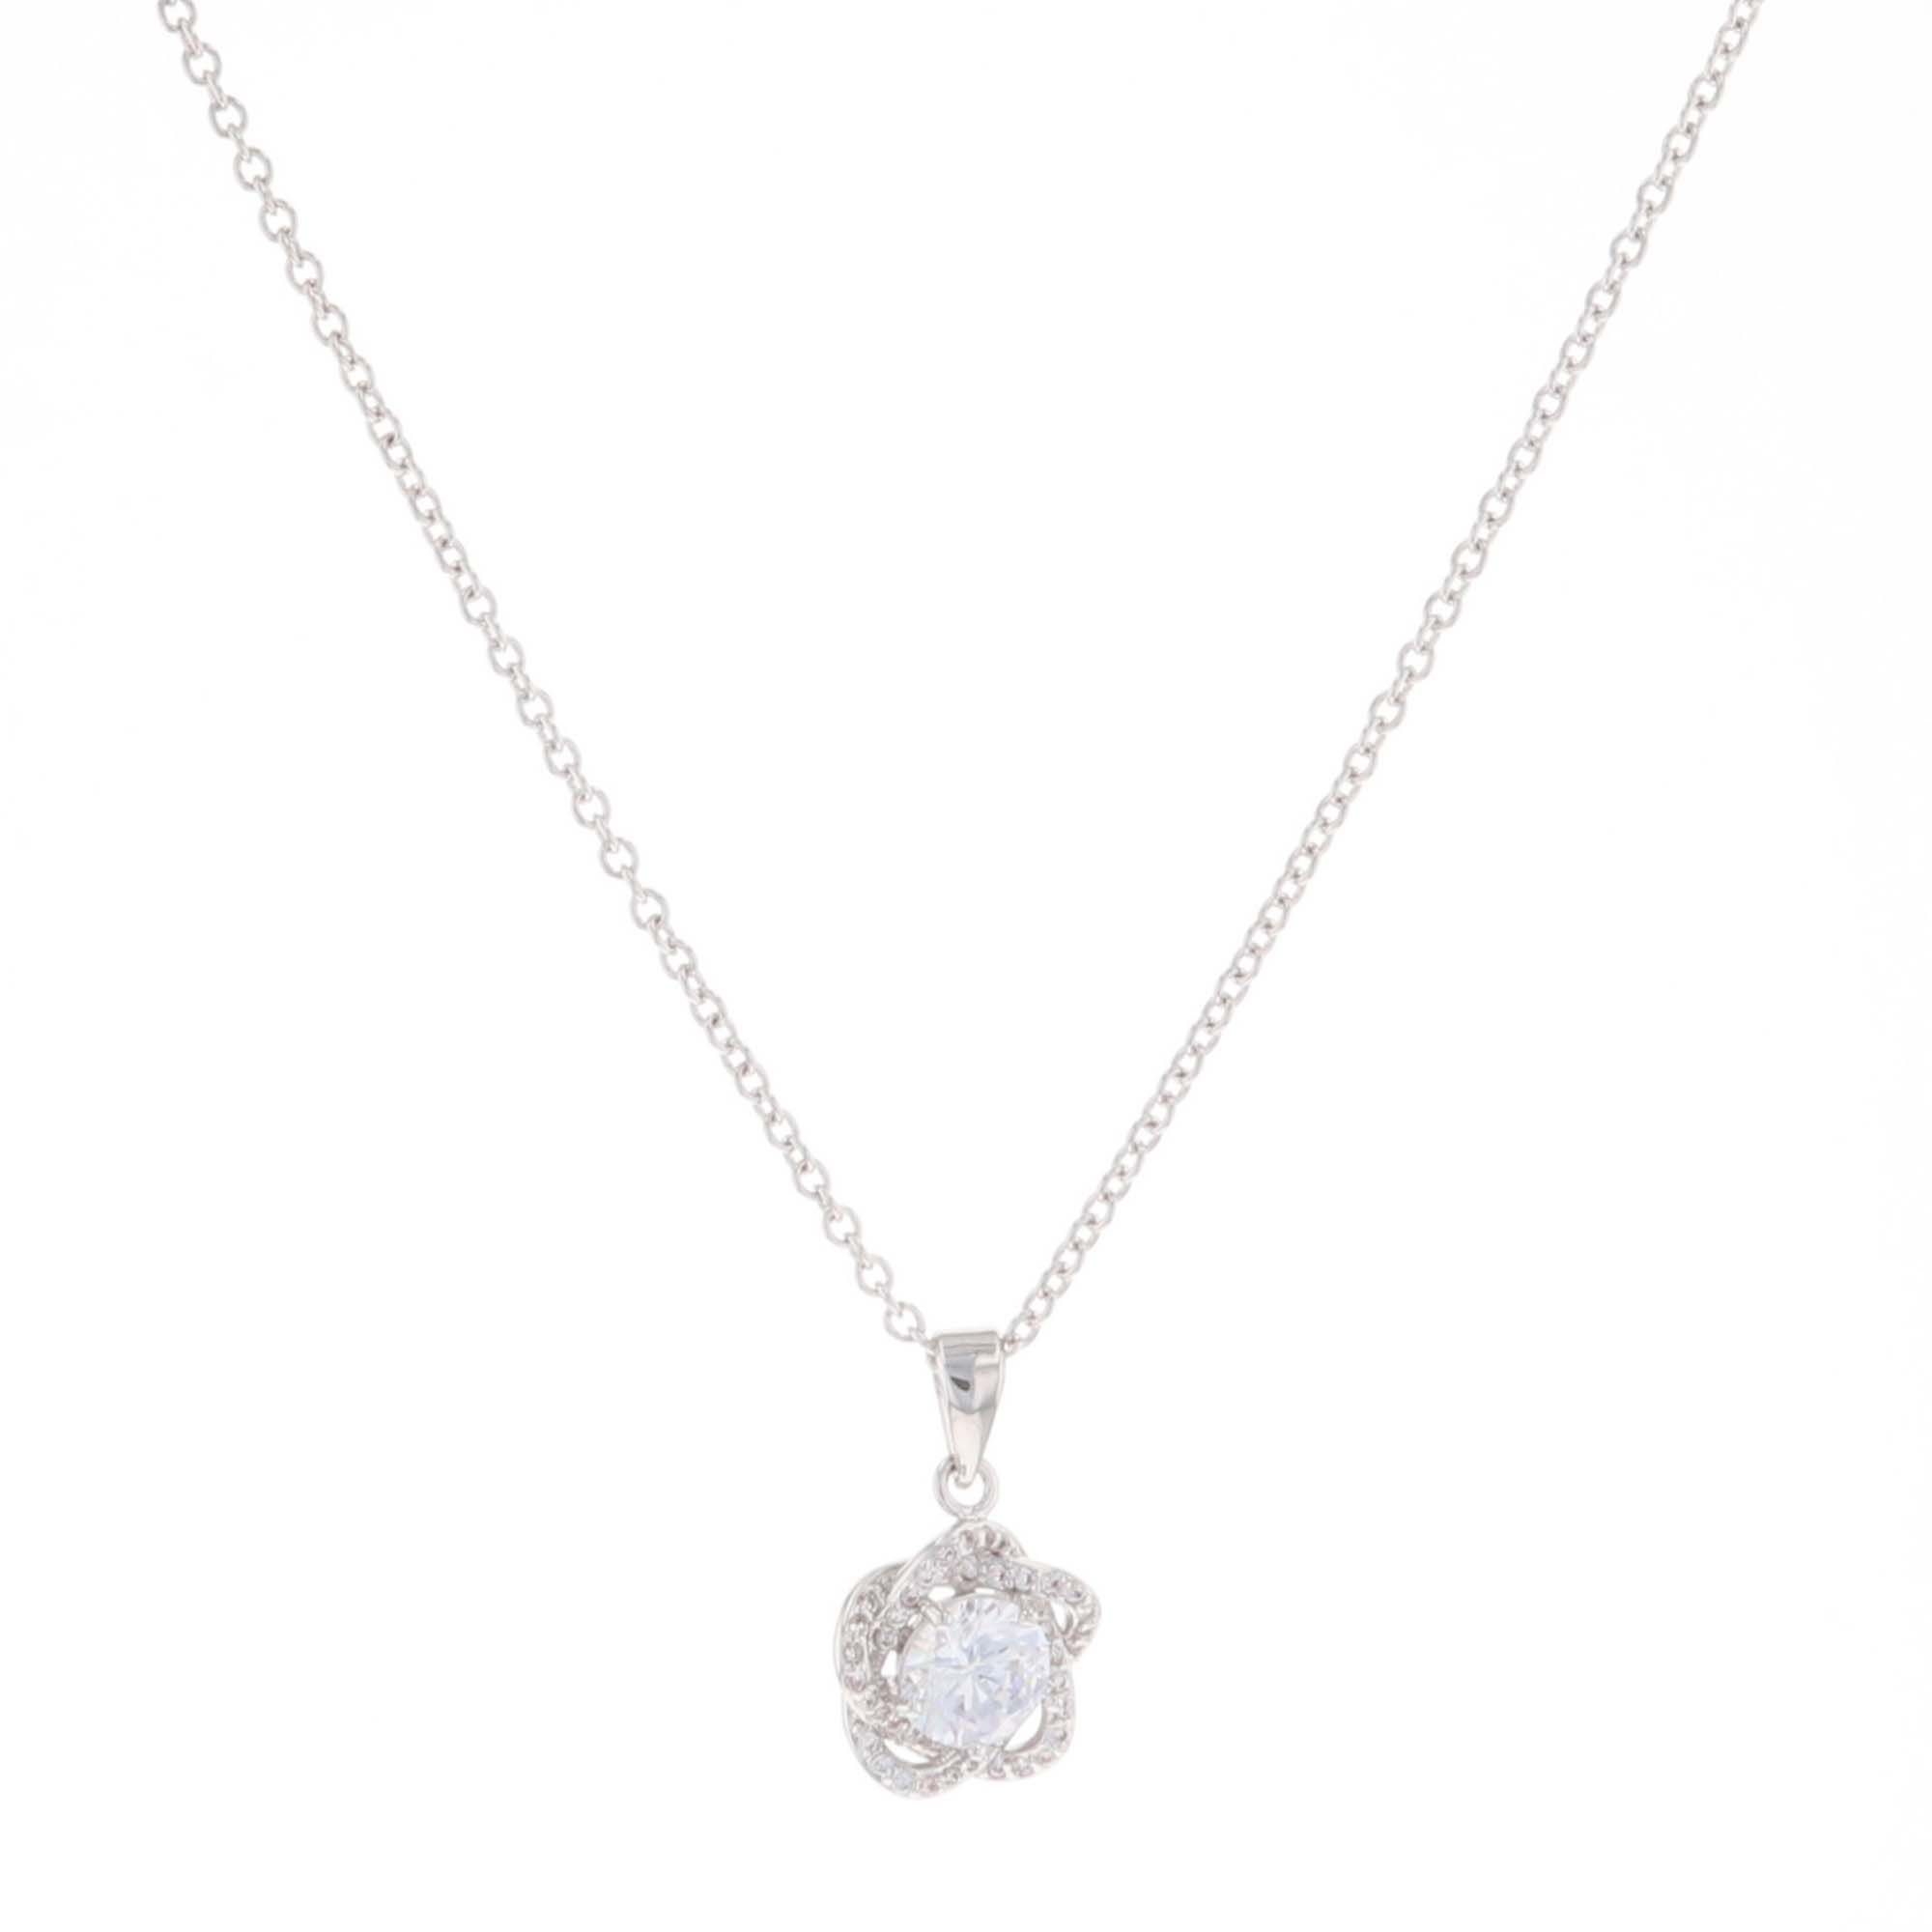 Starlight Flower Necklace